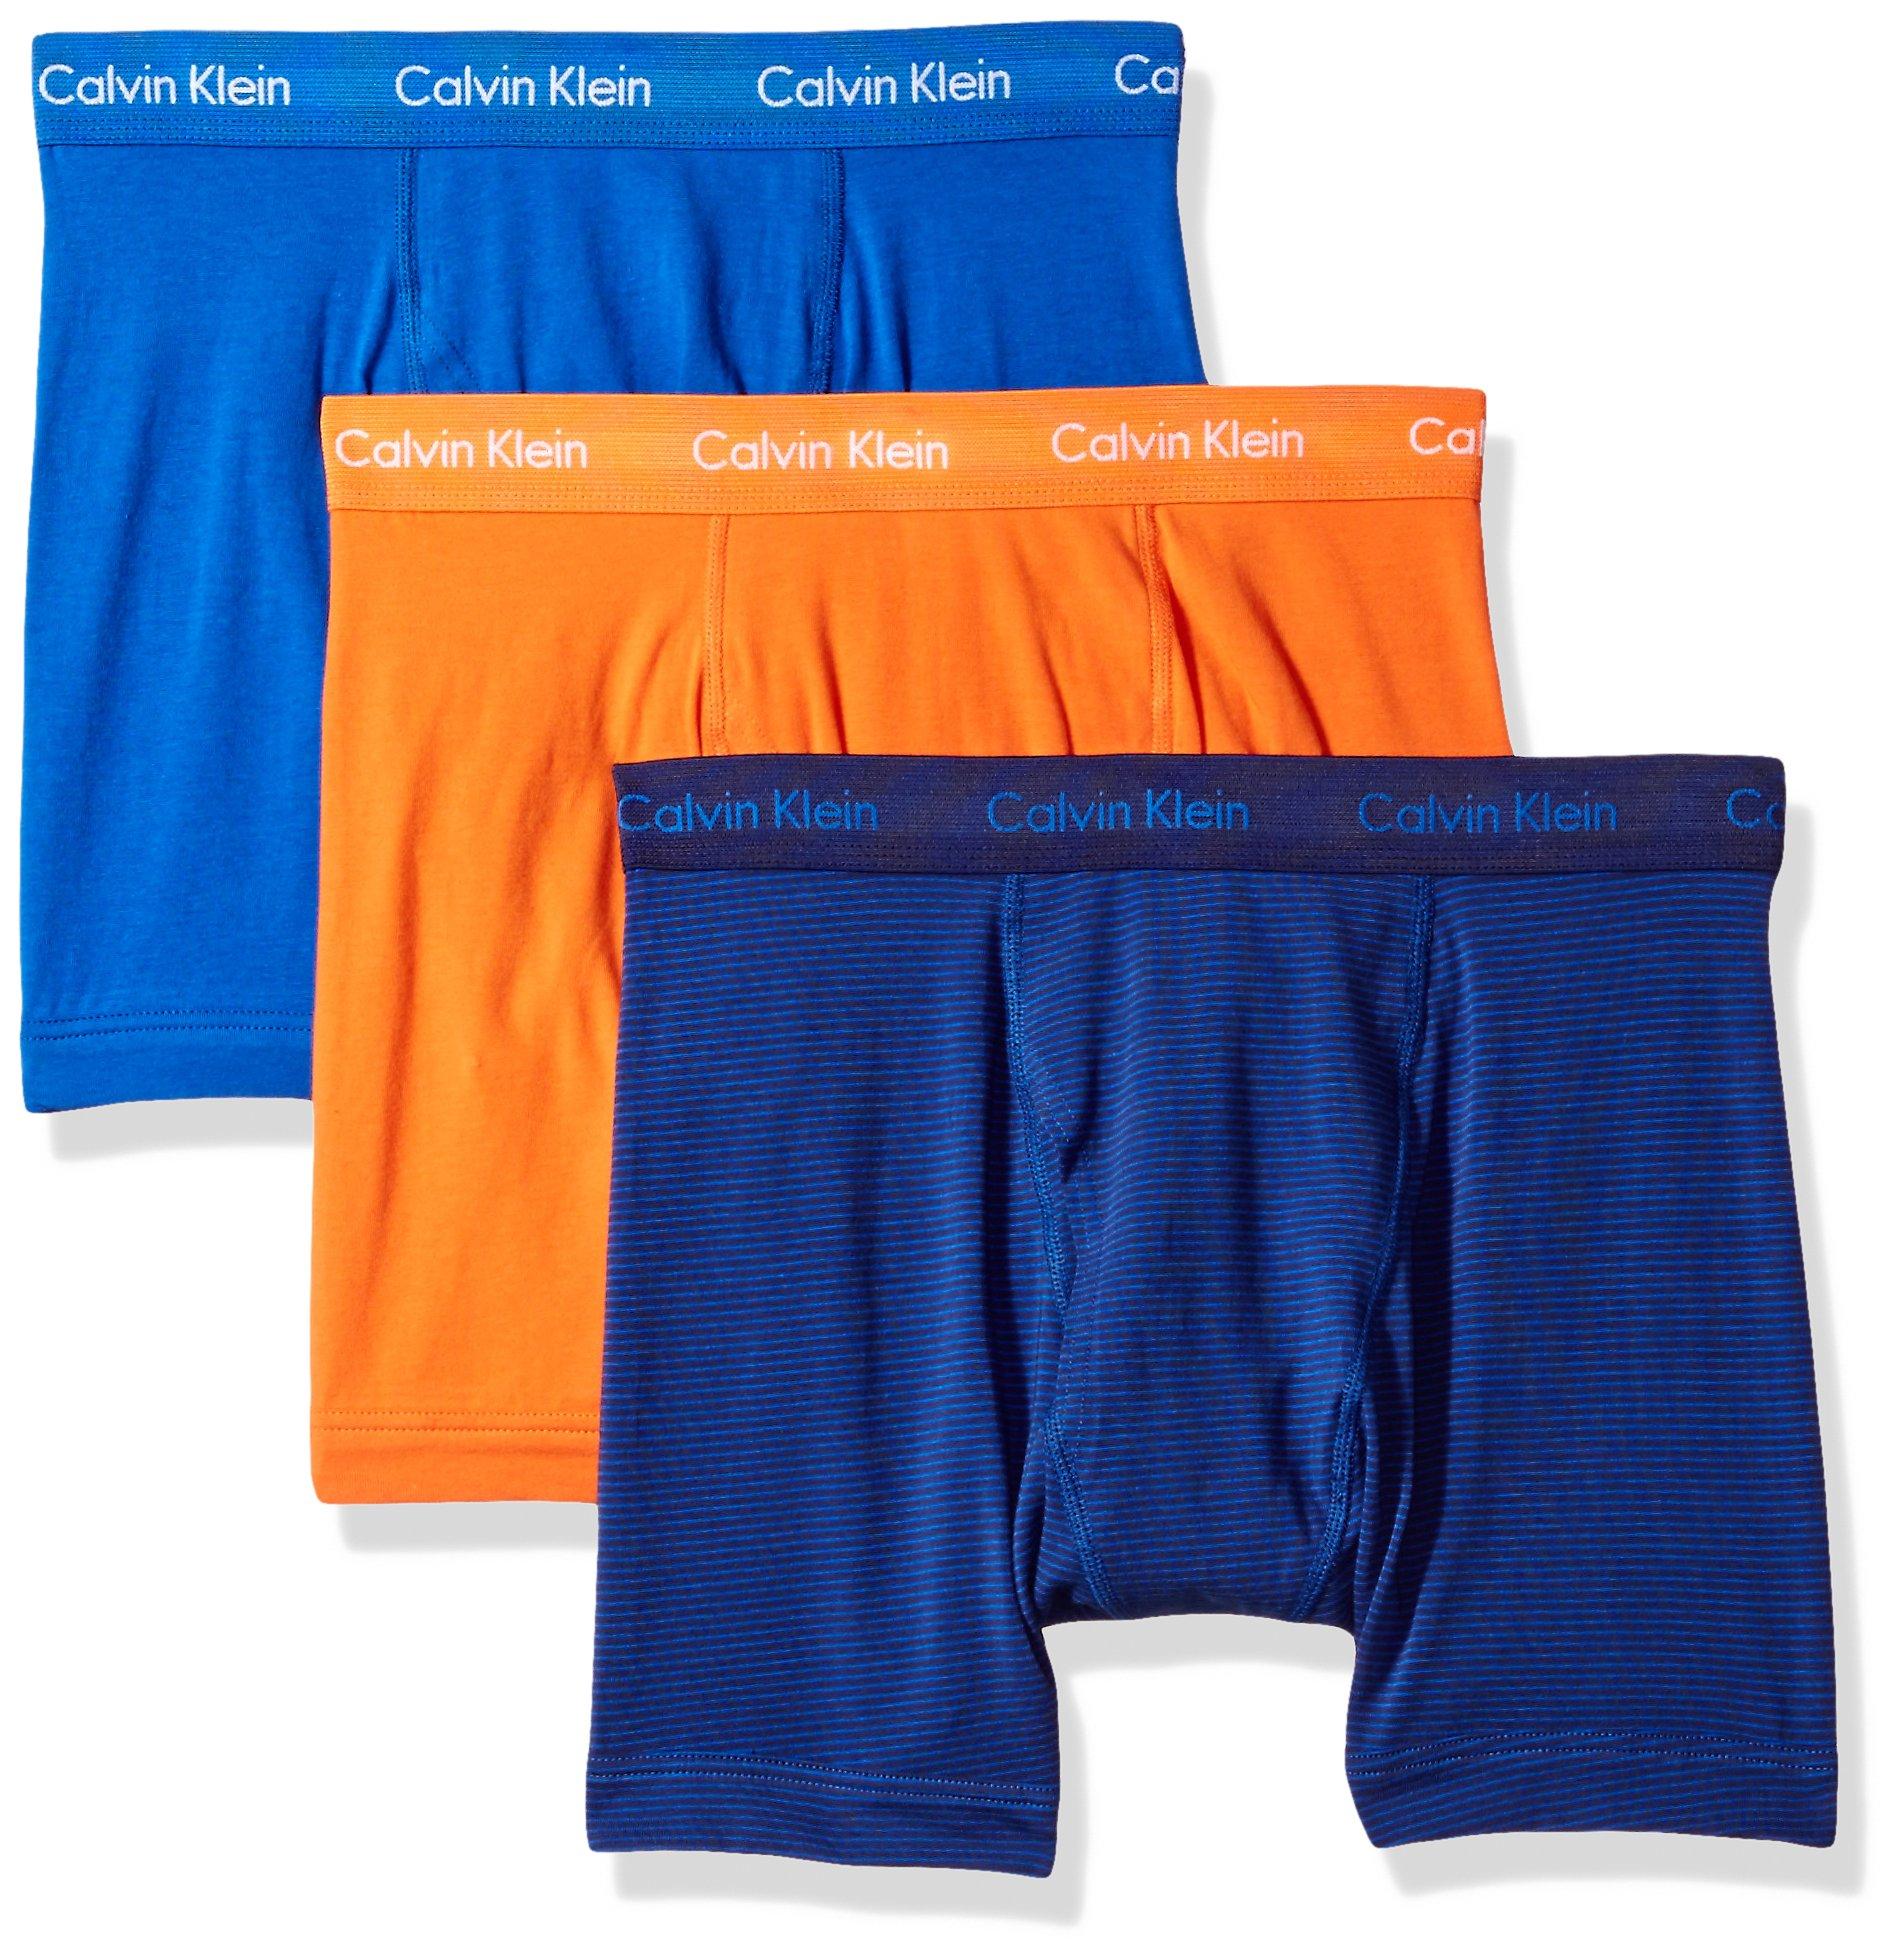 Calvin Klein Men's Underwear Cotton Stretch 3 Pack Boxer Briefs, Muscari Blue/Blue Ribbon/Muscari Blue Stripe/Deep Sunset, Medium